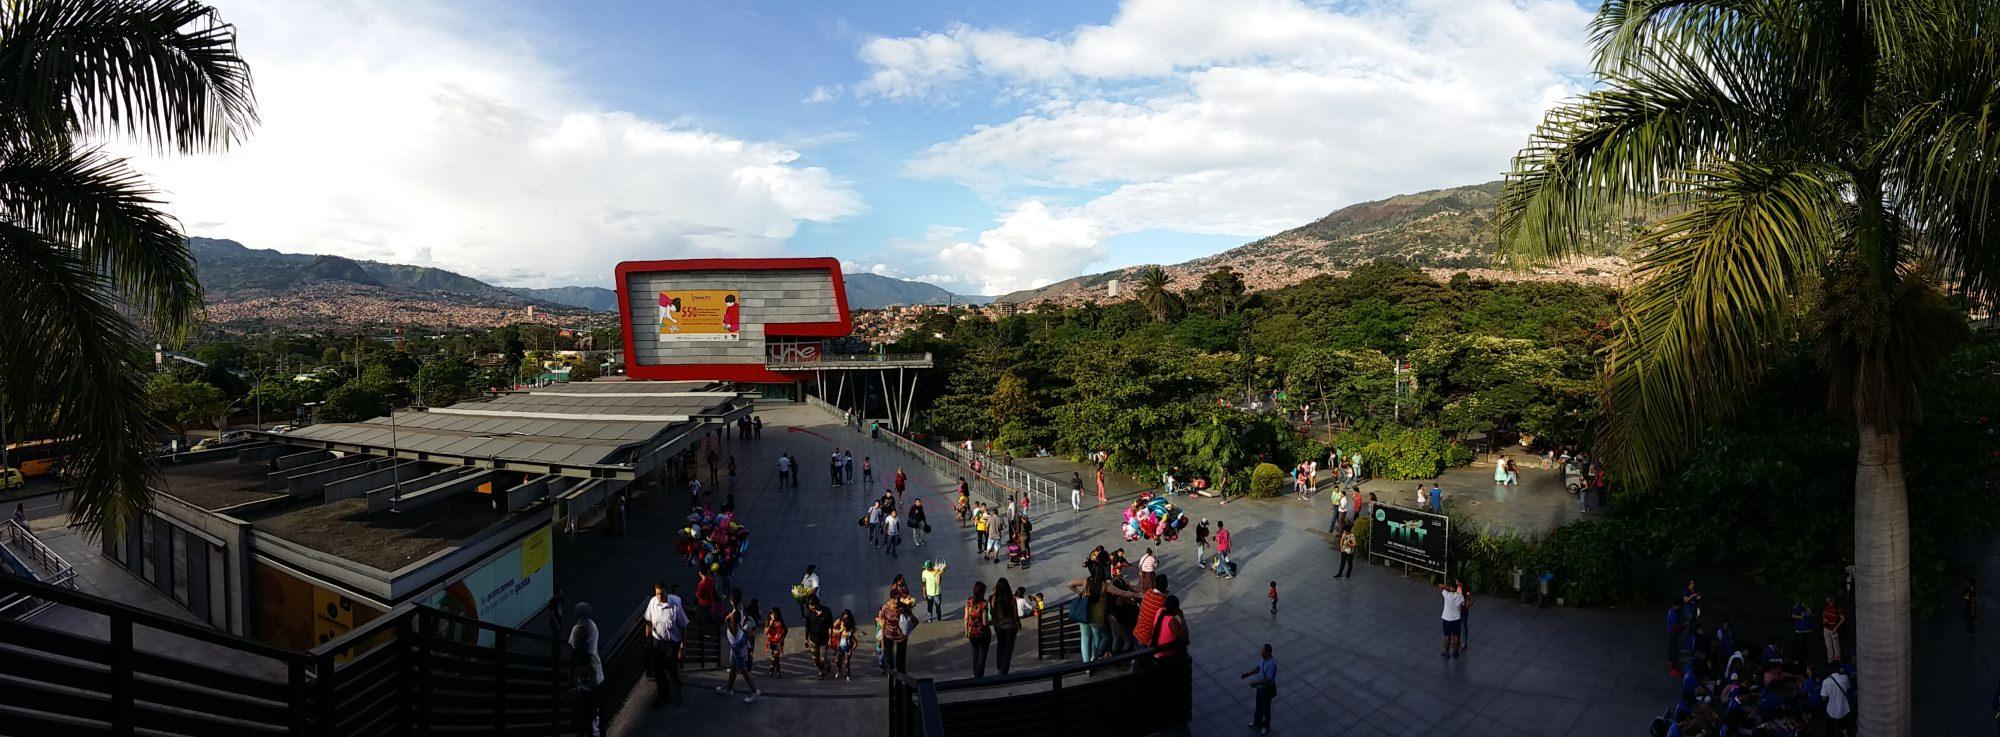 Yoga Internship Program, Medellín, Colombia, South America - teach and work in a yoga studio - travel 4